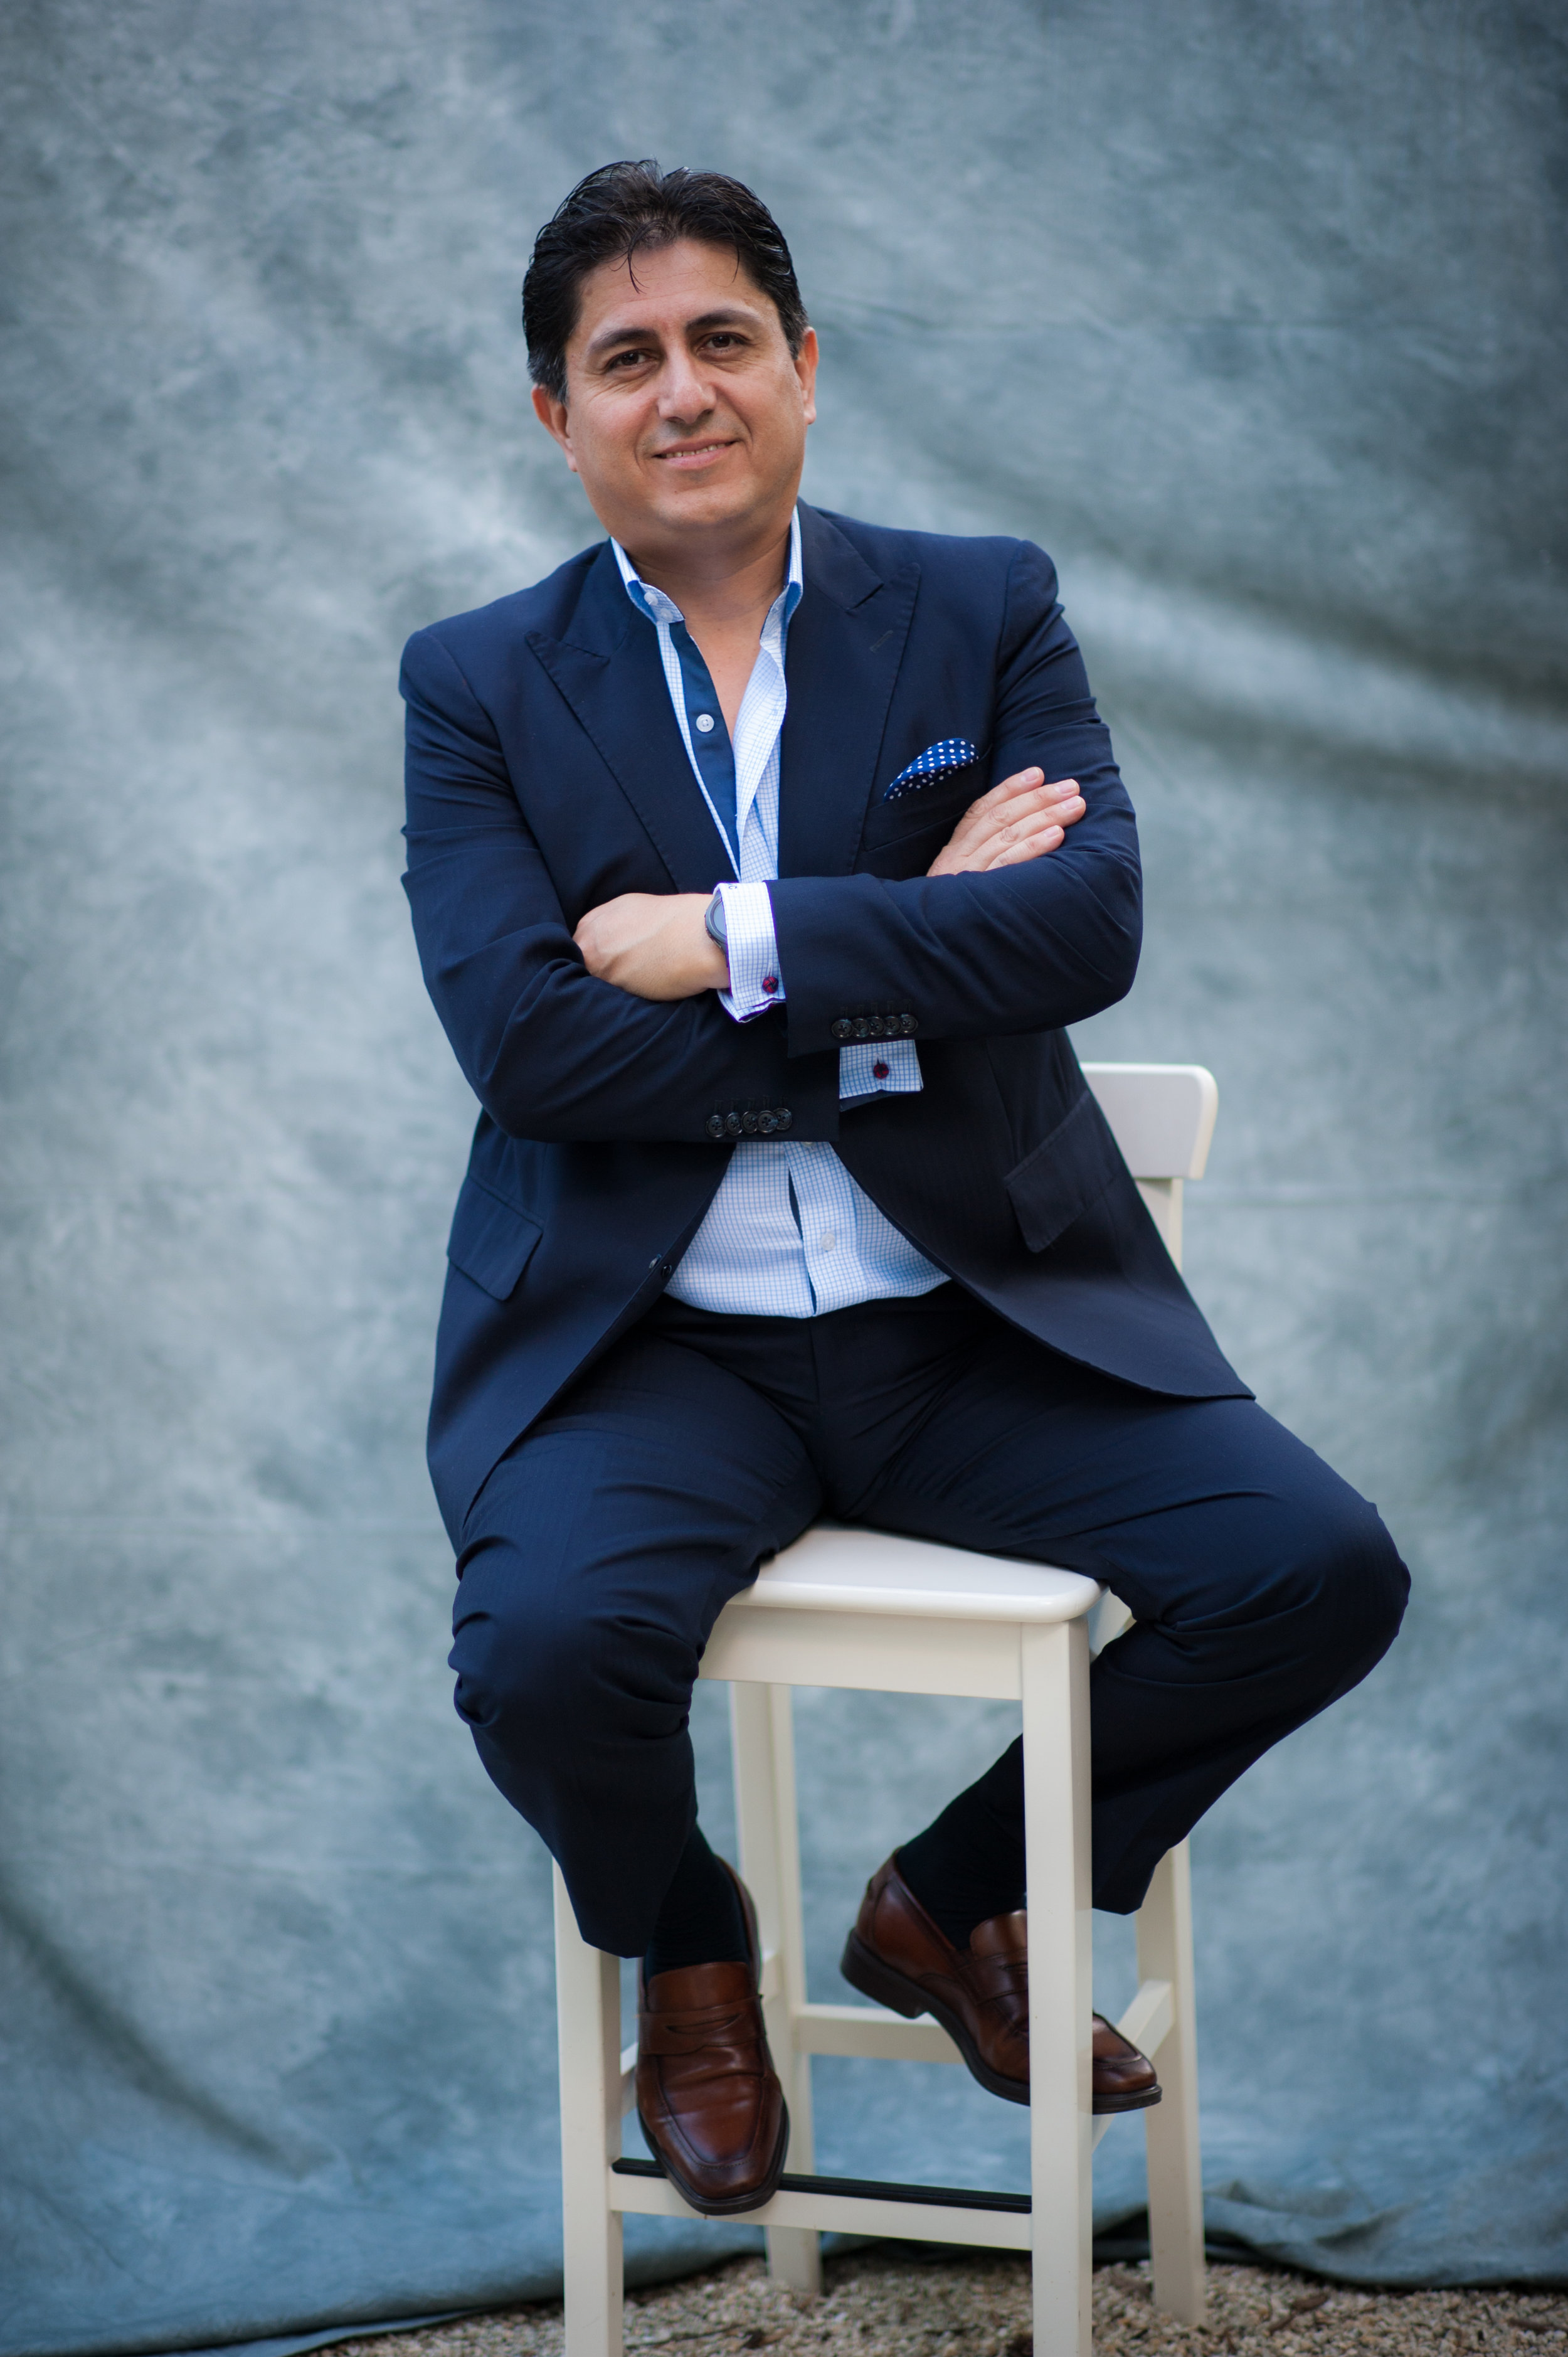 Alejandro Ceron